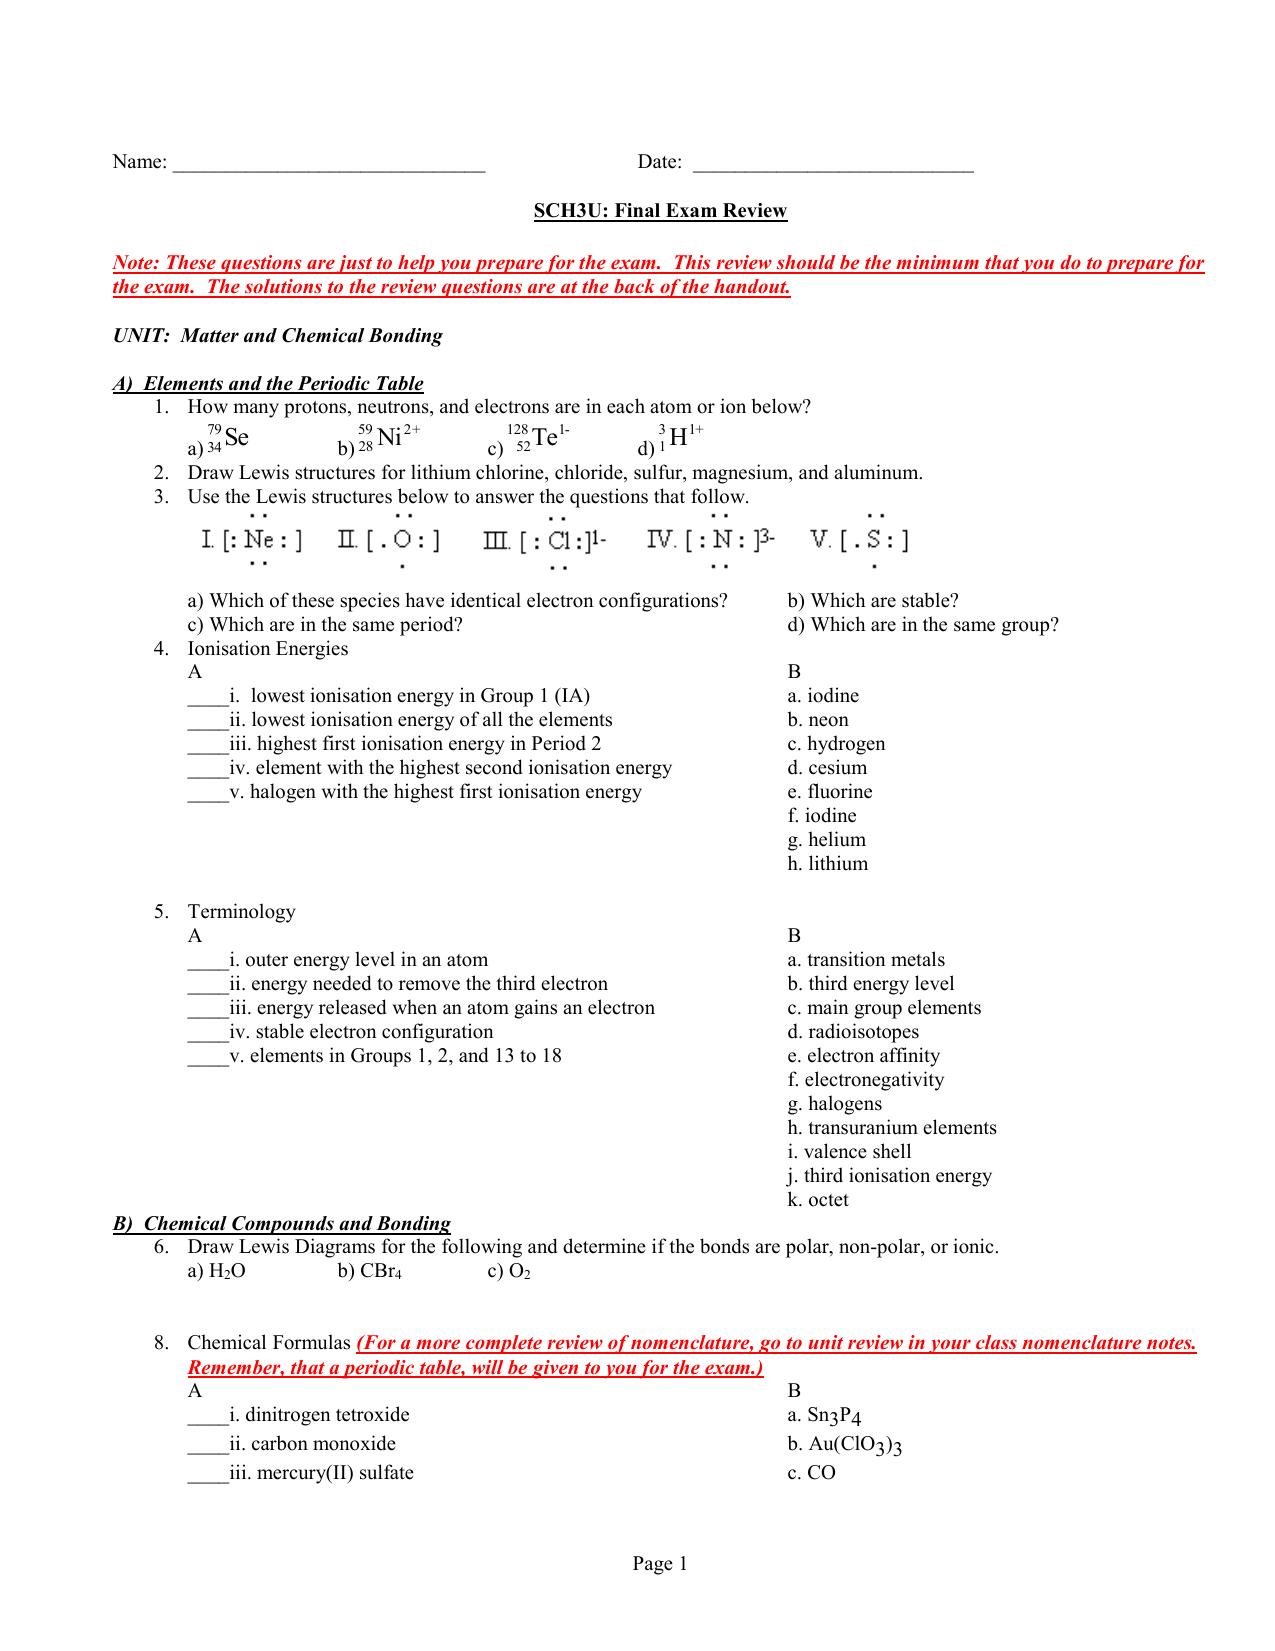 SCH3U: Final Exam Review